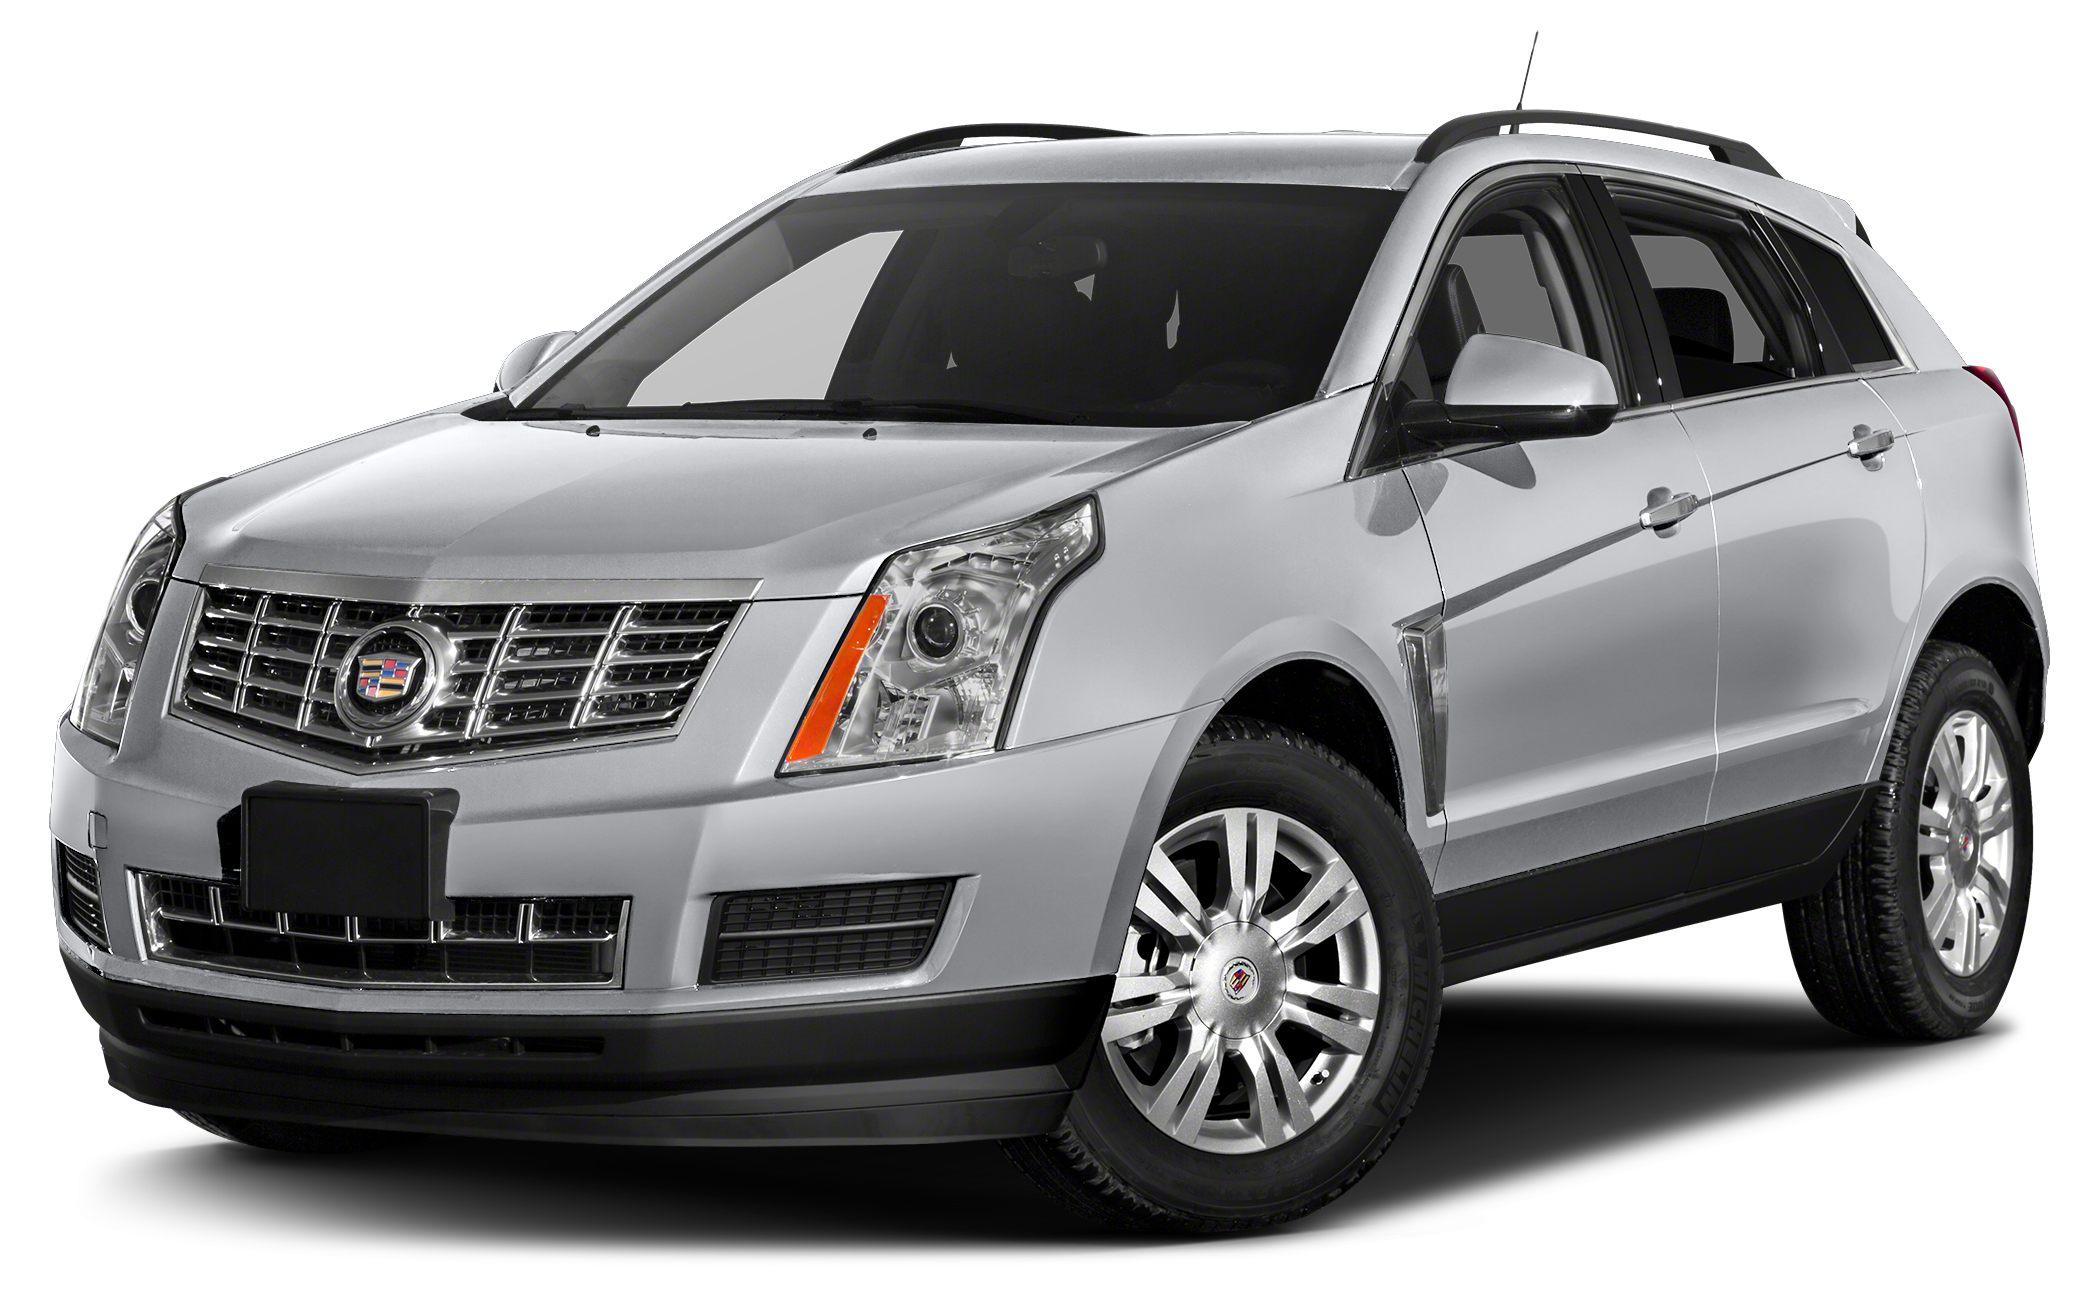 2014 Cadillac SRX Luxury Collection SRX Luxury 36L V6 DGI DOHC VVT 6-Speed Automatic FWD Radi